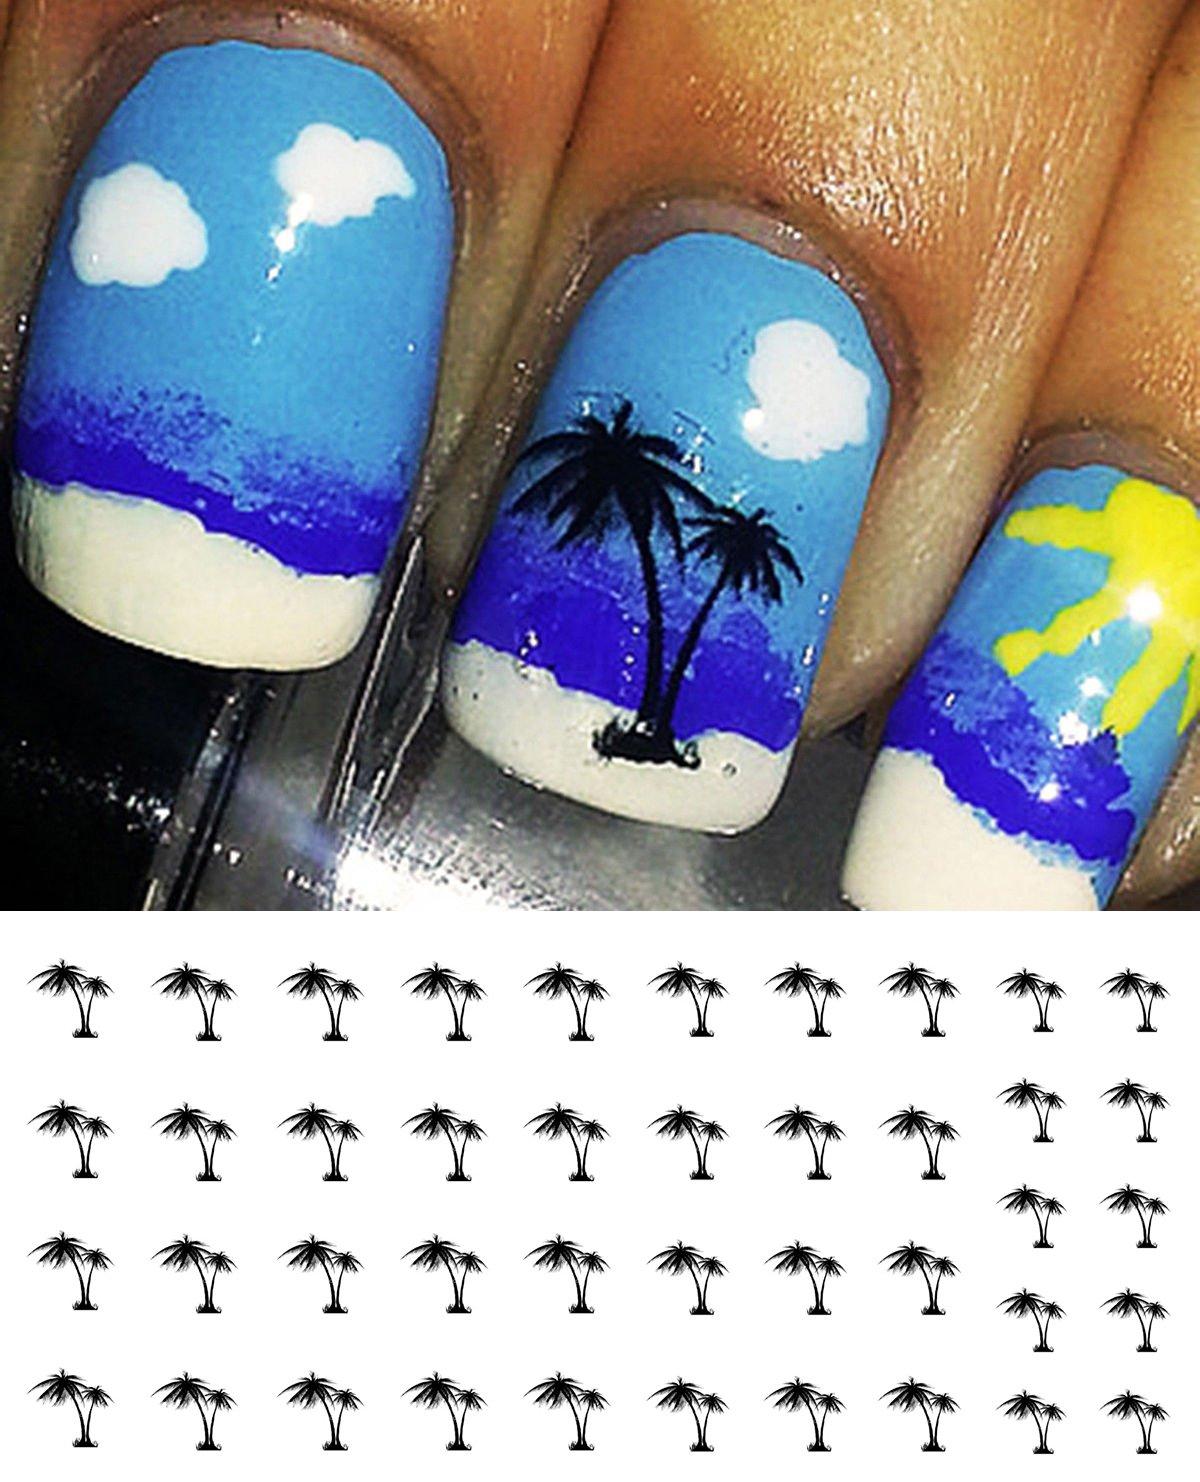 Amazon.com: Palm Trees Water Slide Nail Art Decals - Salon Quality ...